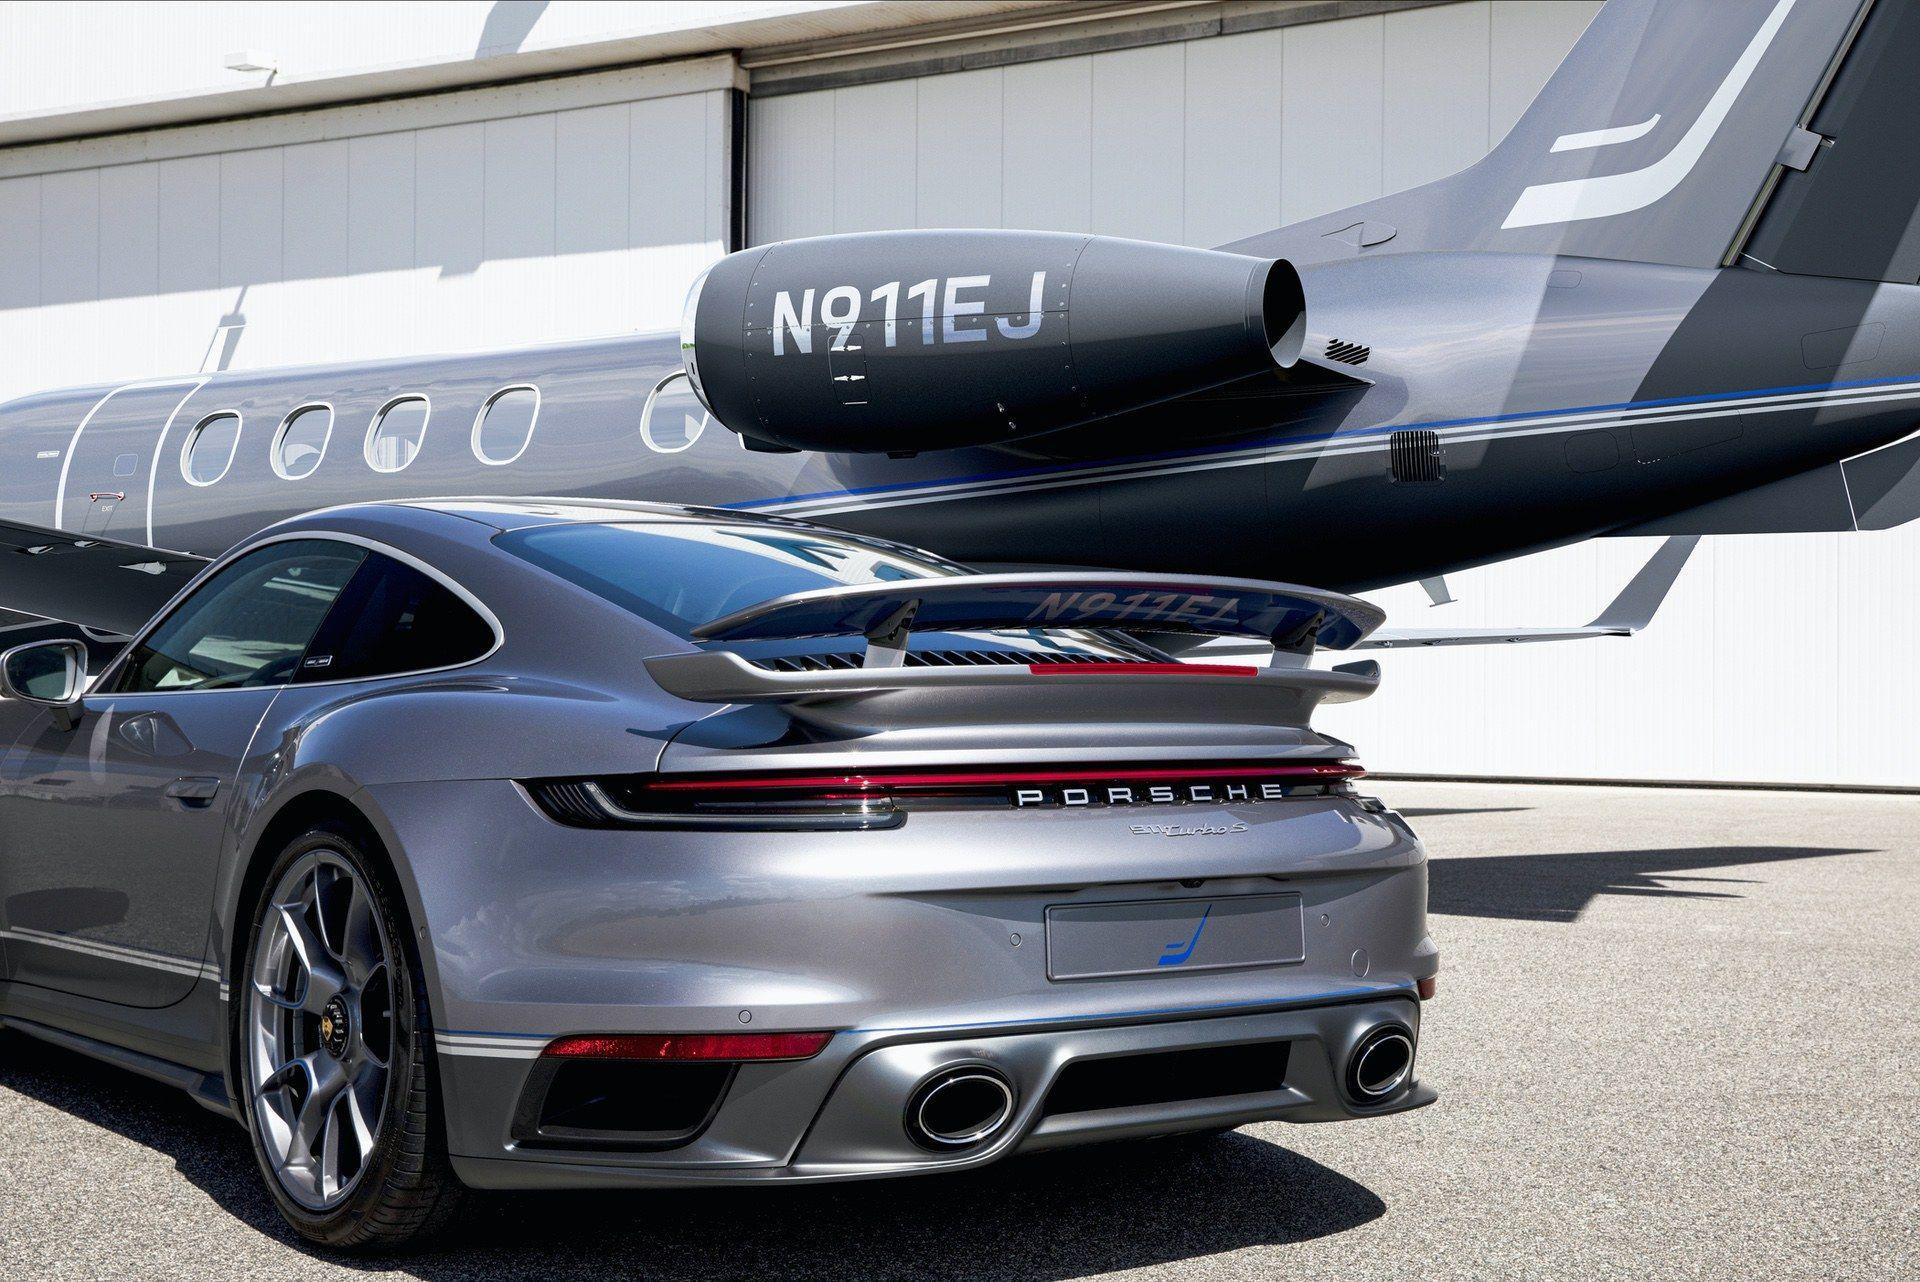 Embraer_Porsche_911_Turbo_S_0003